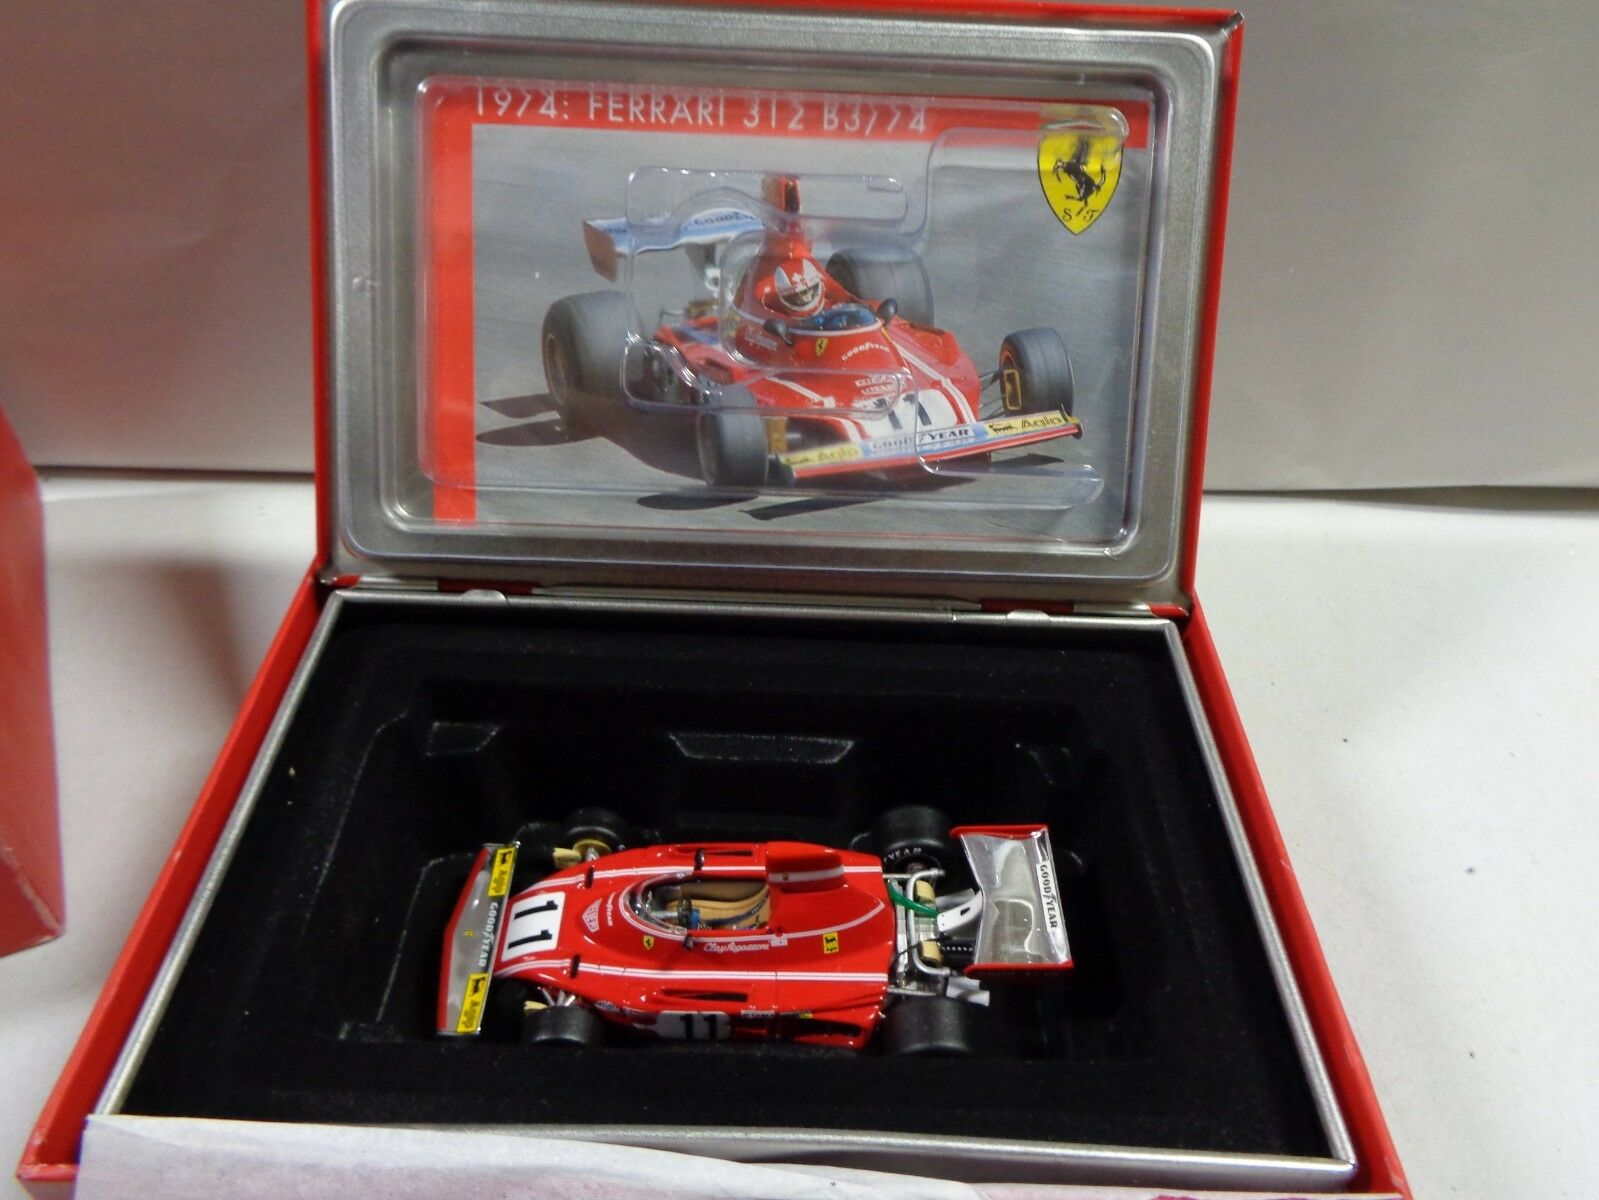 Hot Wheels 1974 Ferrari 312 B3 74